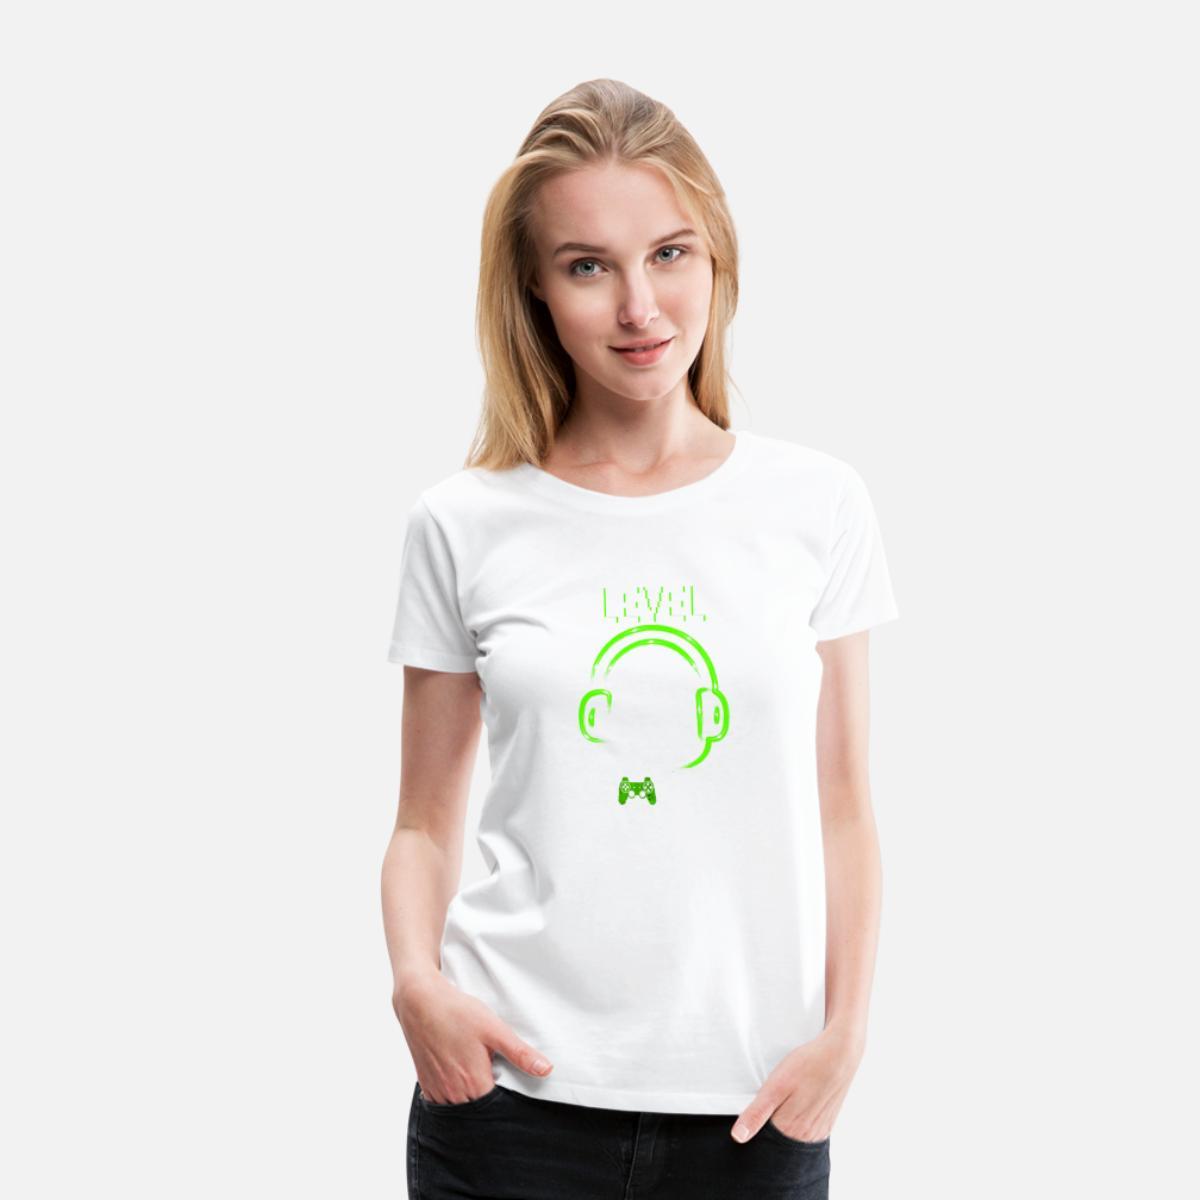 8. Geburtstag Gamer Level 8 Complete' Frauen Premium T Shirt ...